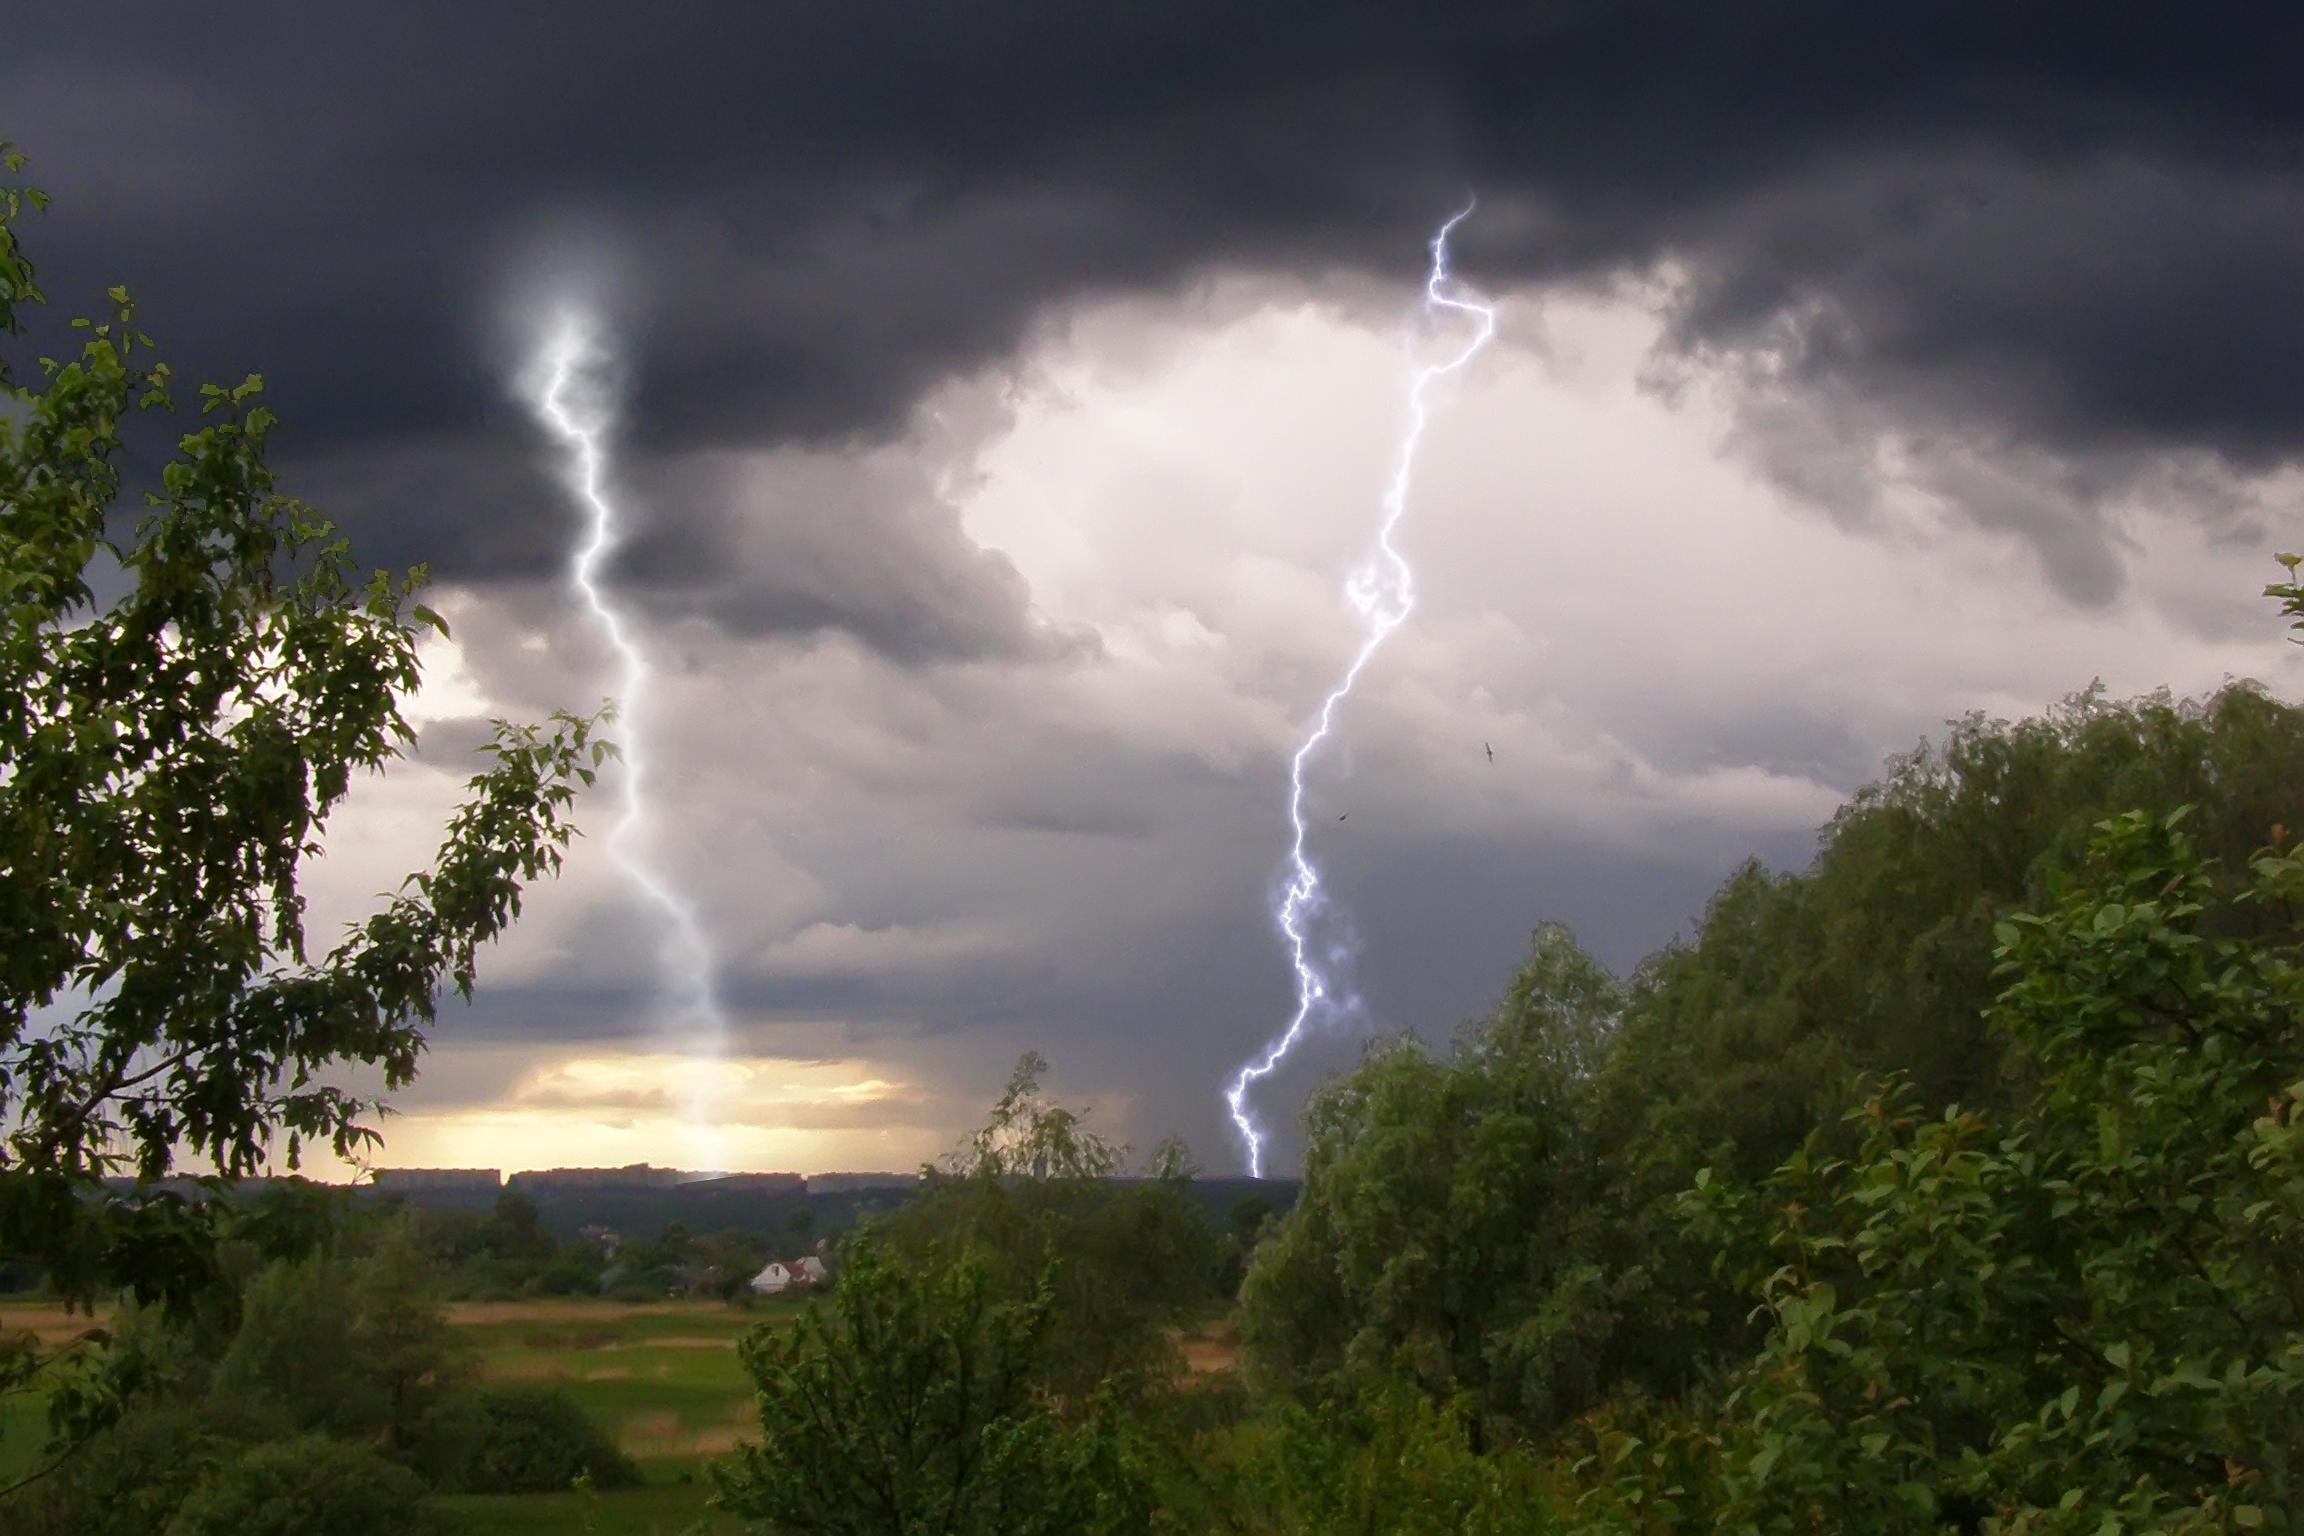 картинки грома и дождя фотографа портфолио лежат